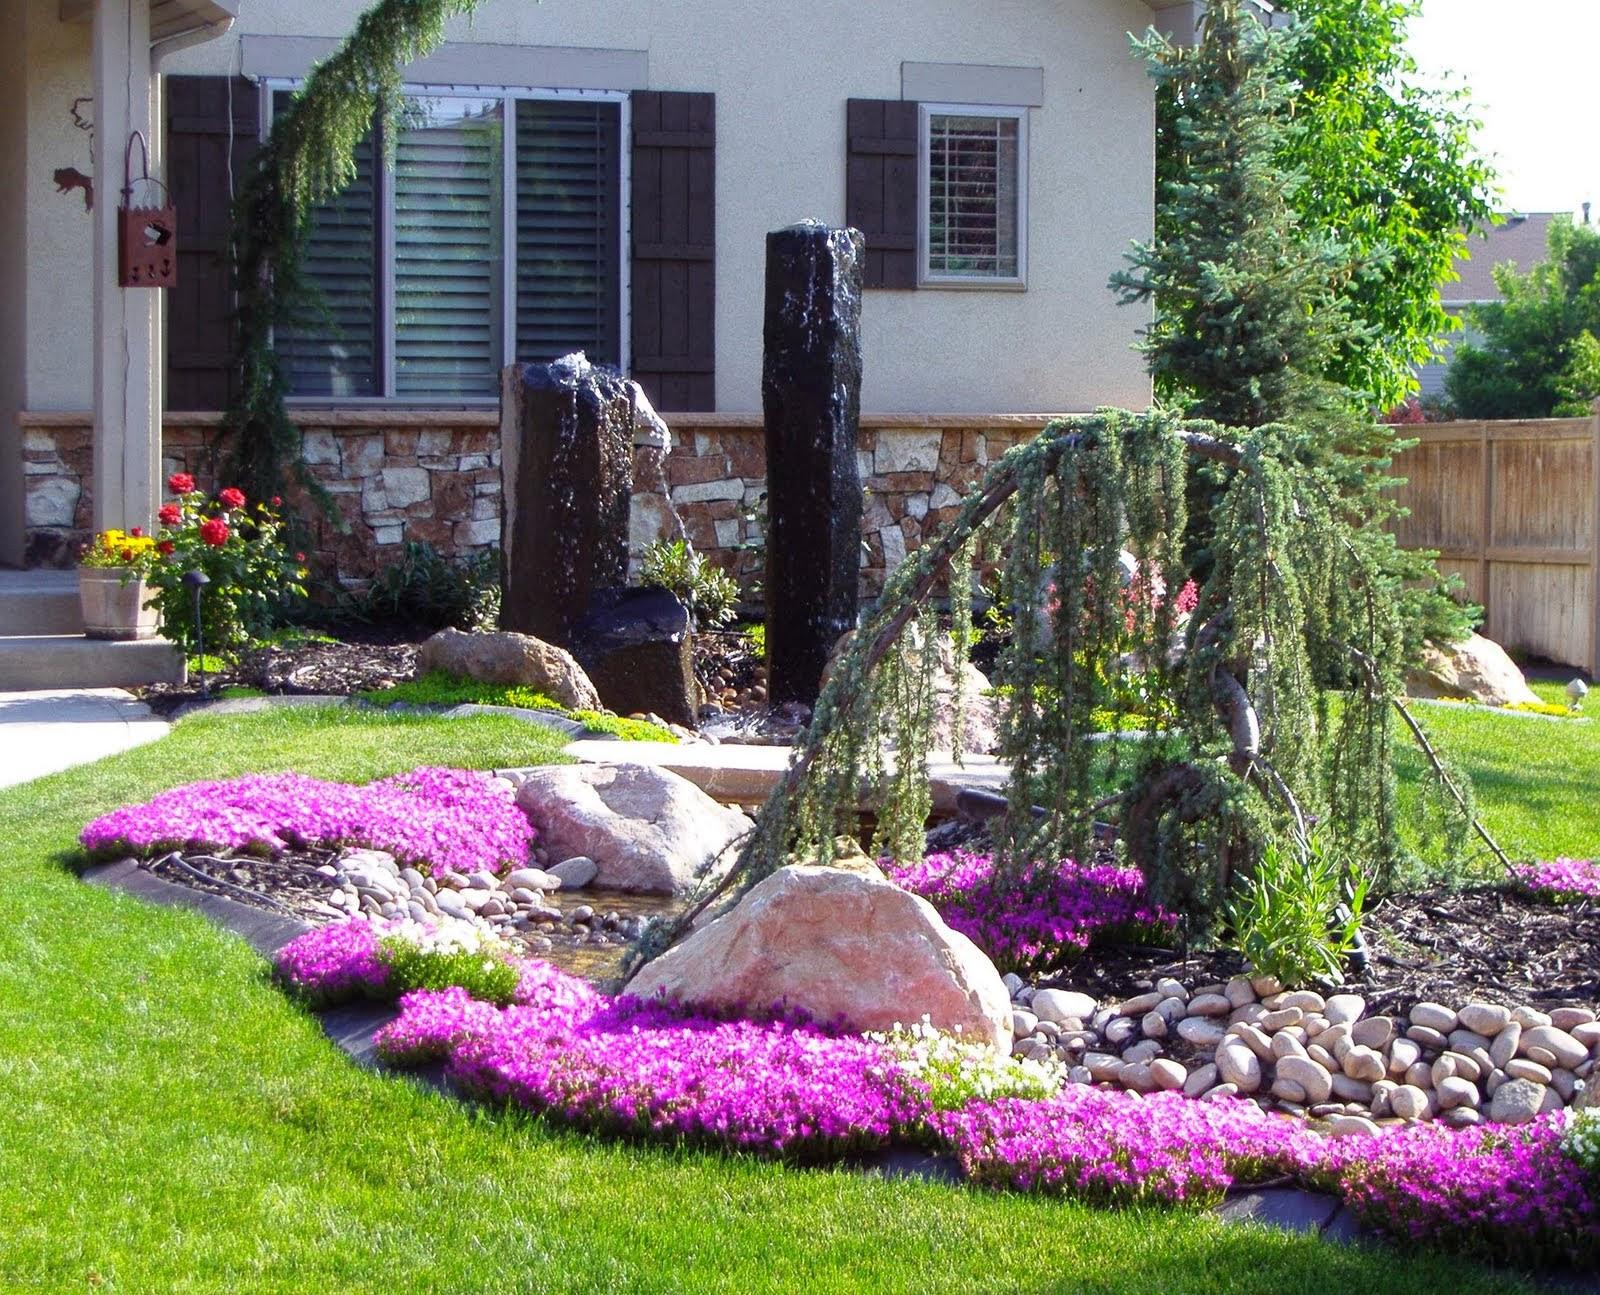 Landscape Design For Front Yards  Gardening and Landscaping Front Yard Landscaping Ideas